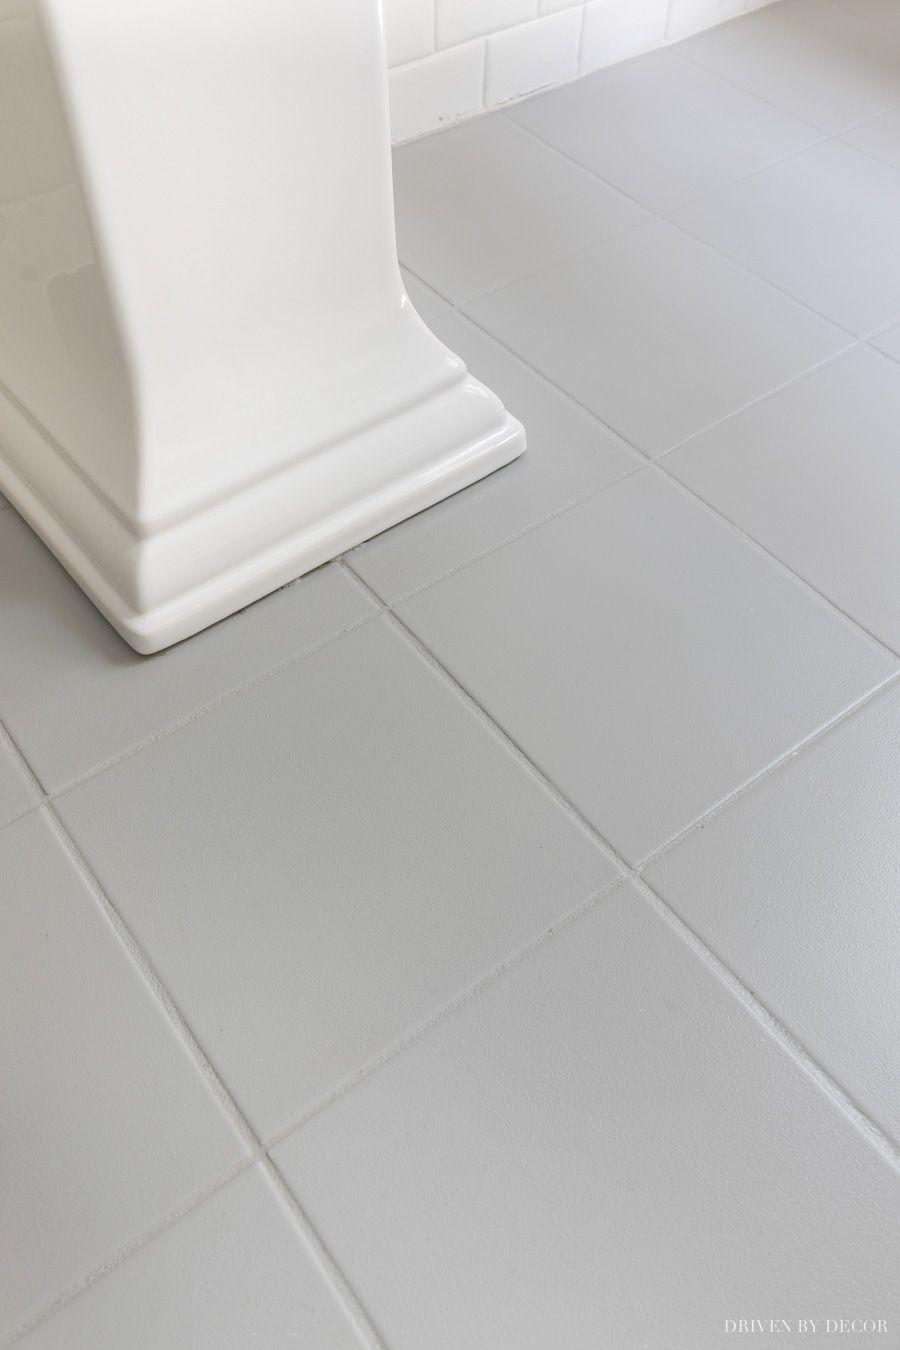 My Painted Bathroom Tile Did It Last With Images Painted Bathroom Floors Painting Bathroom Tiles Tile Floor